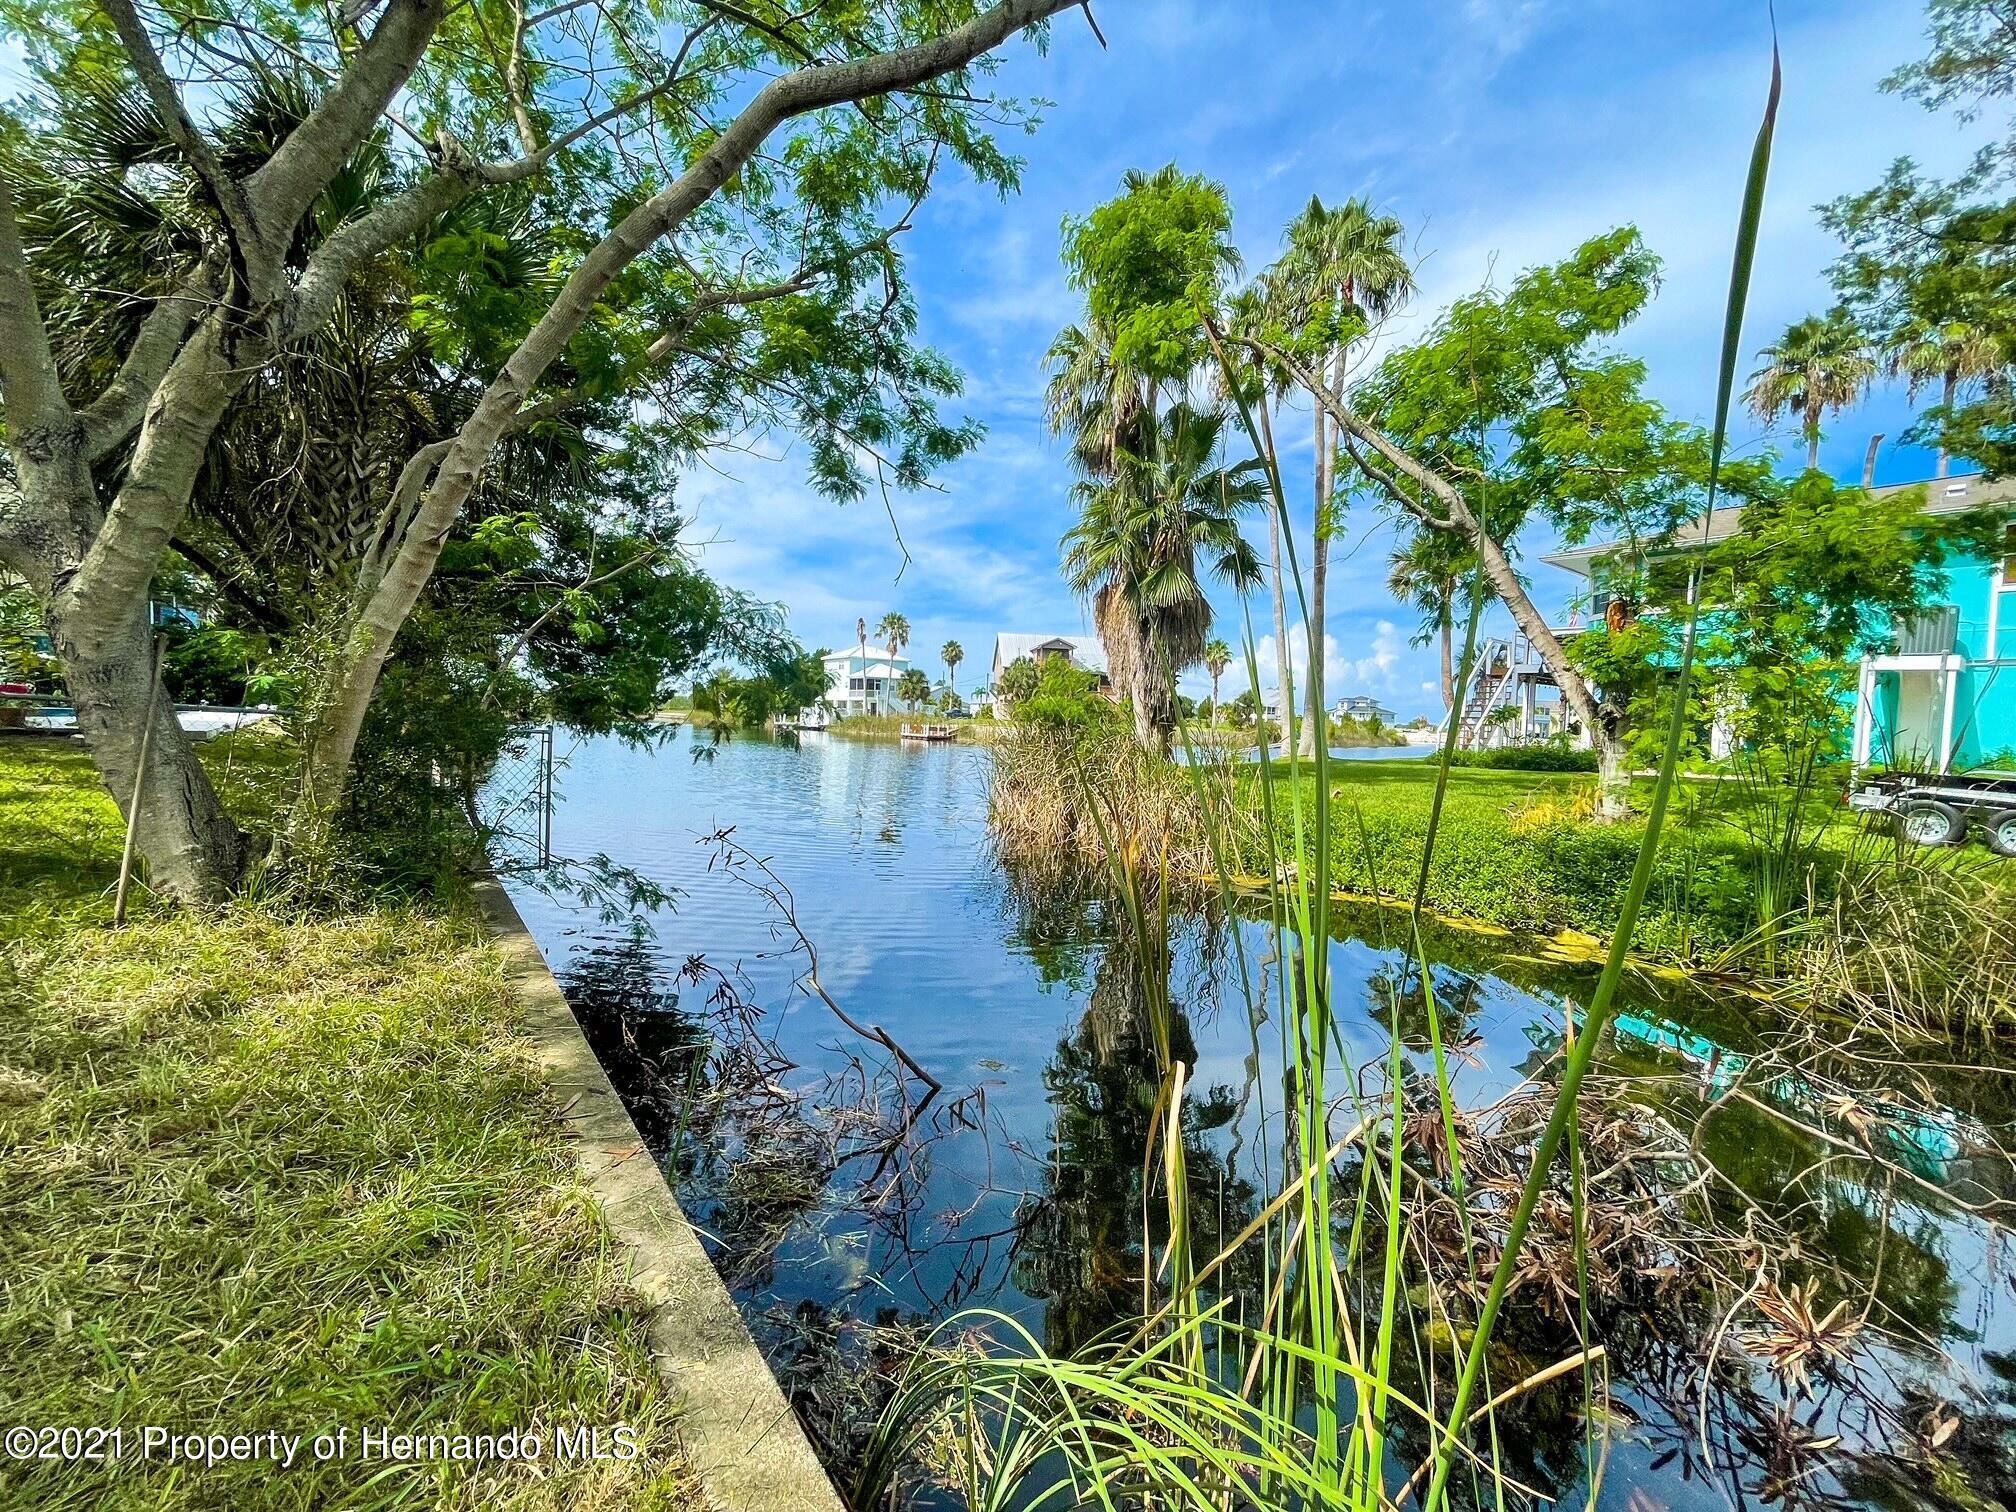 Details for 000 Crape Myrtle Drive, Hernando Beach, FL 34607